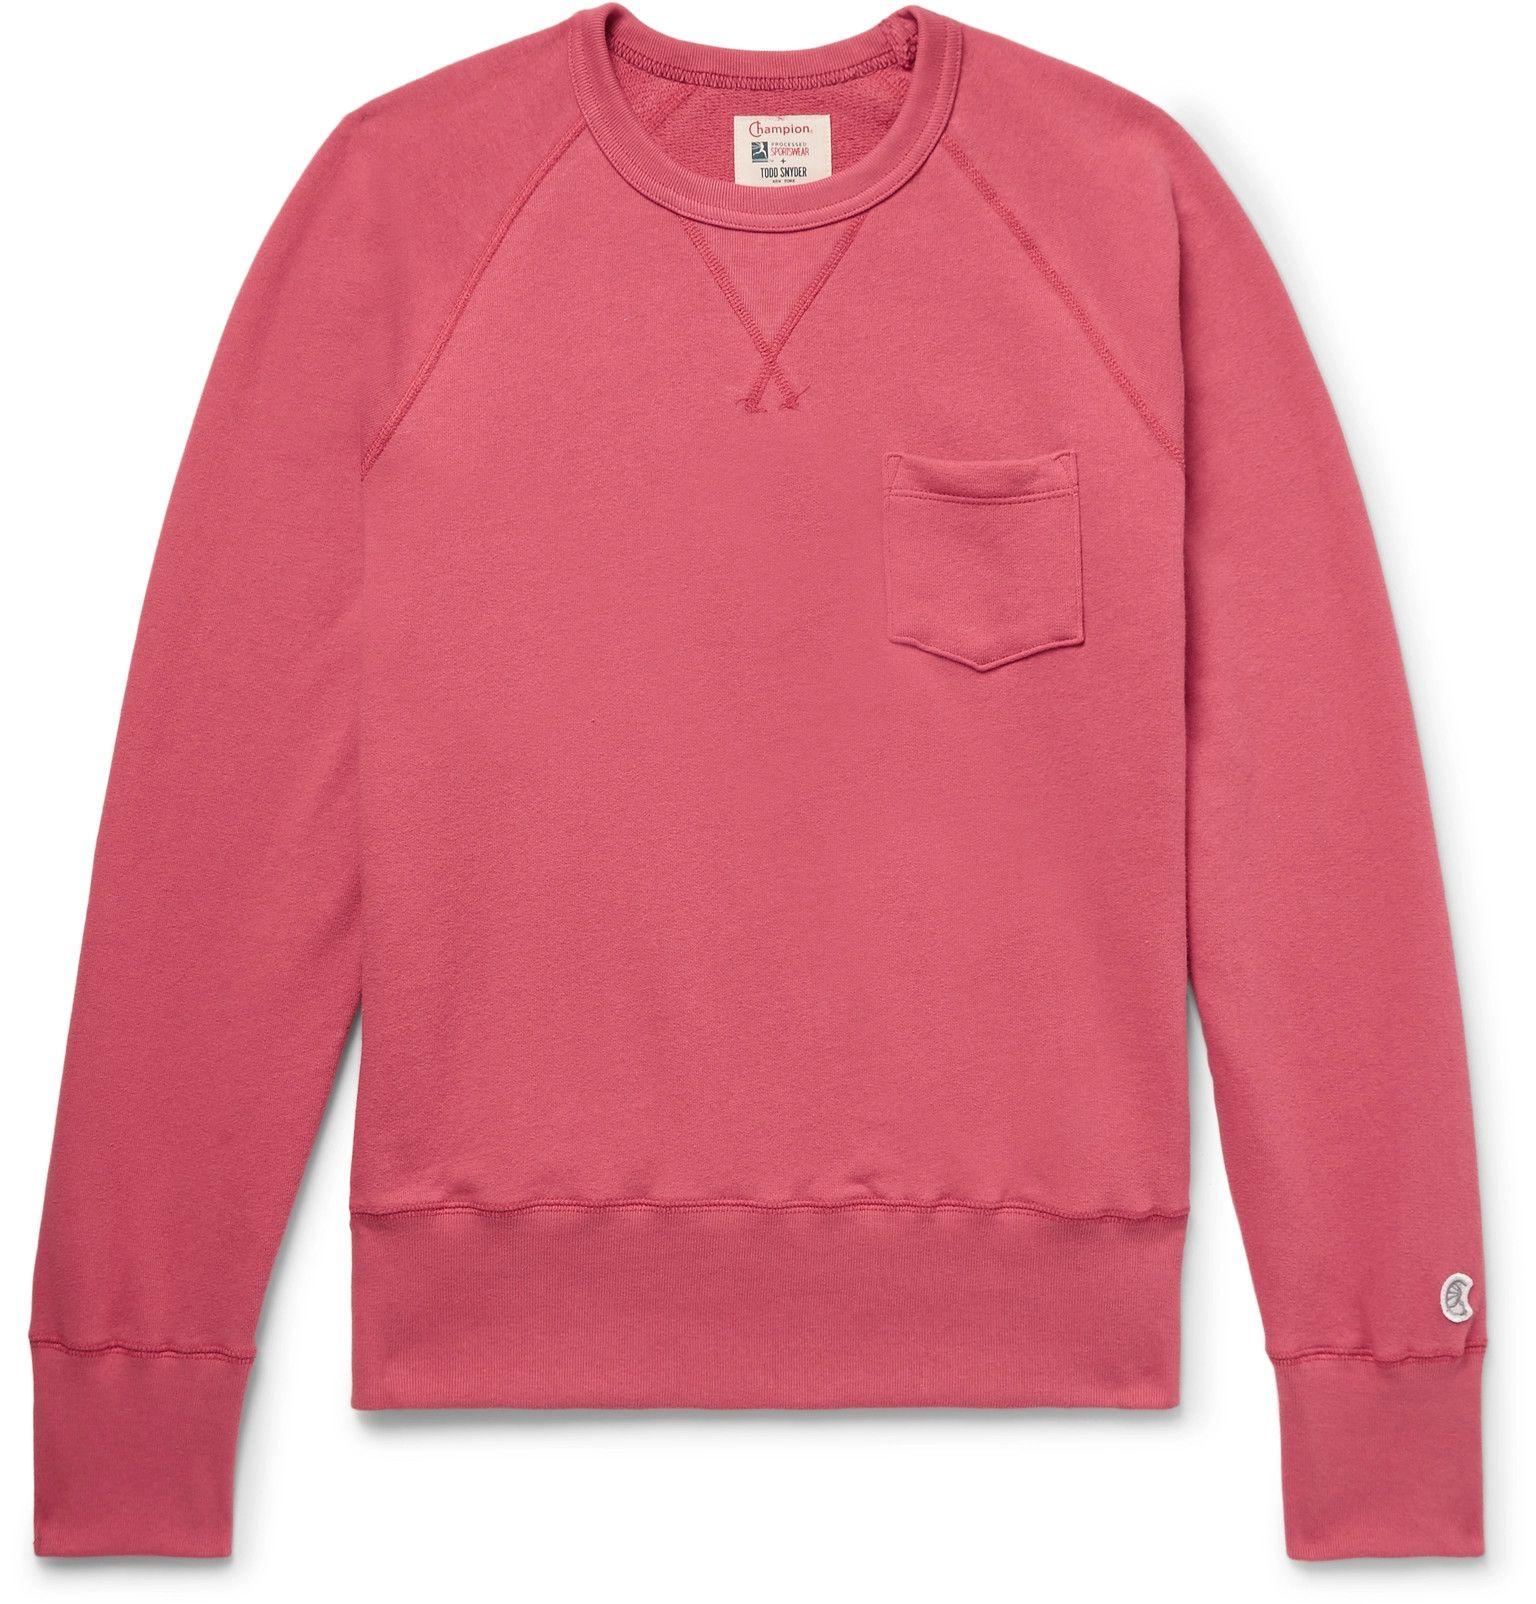 fdc540882632 Todd Snyder + Champion - Slim-Fit Loopback Cotton-Jersey Sweatshirt ...